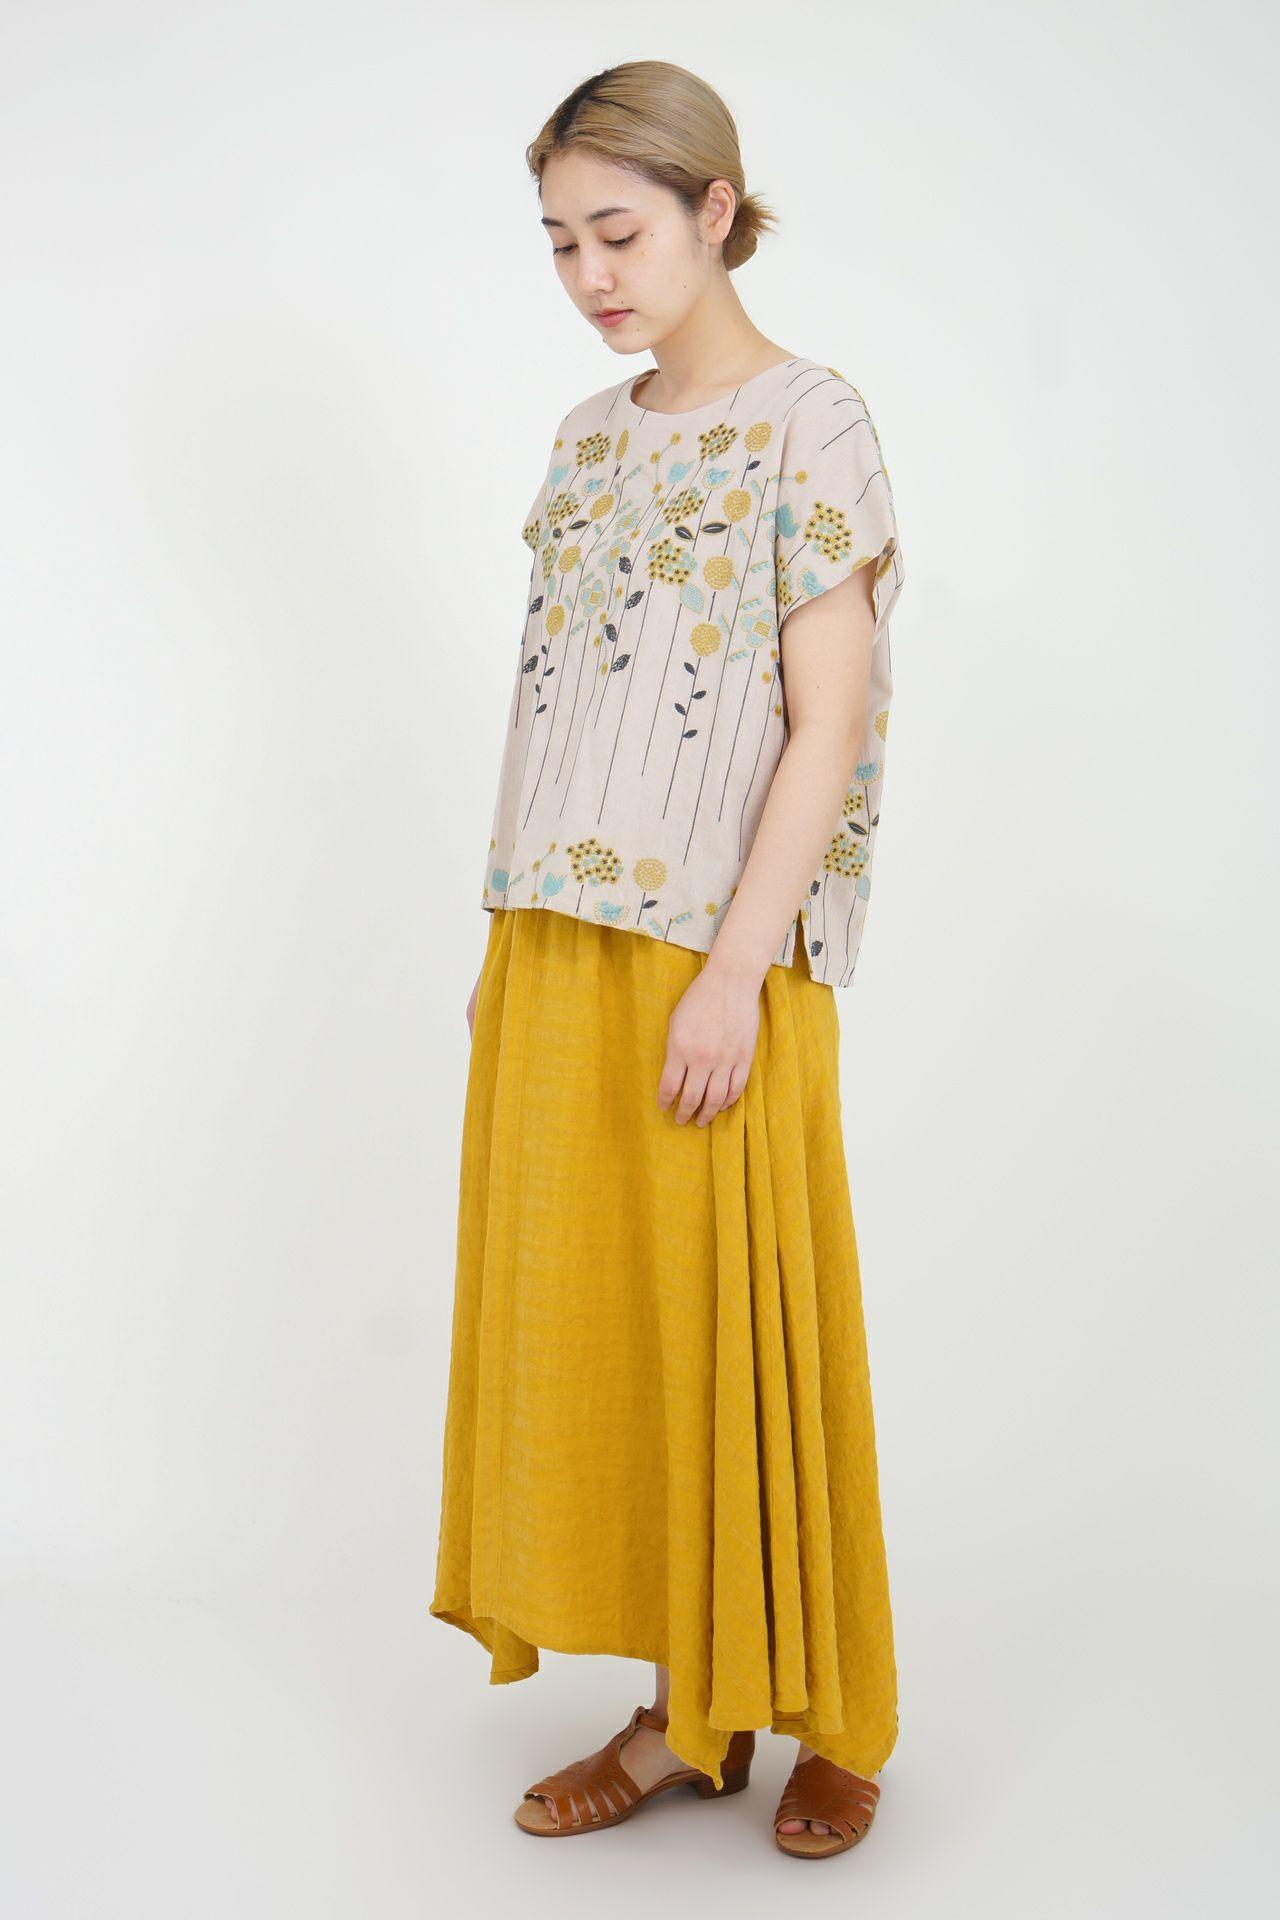 YELLOW/model:164cm